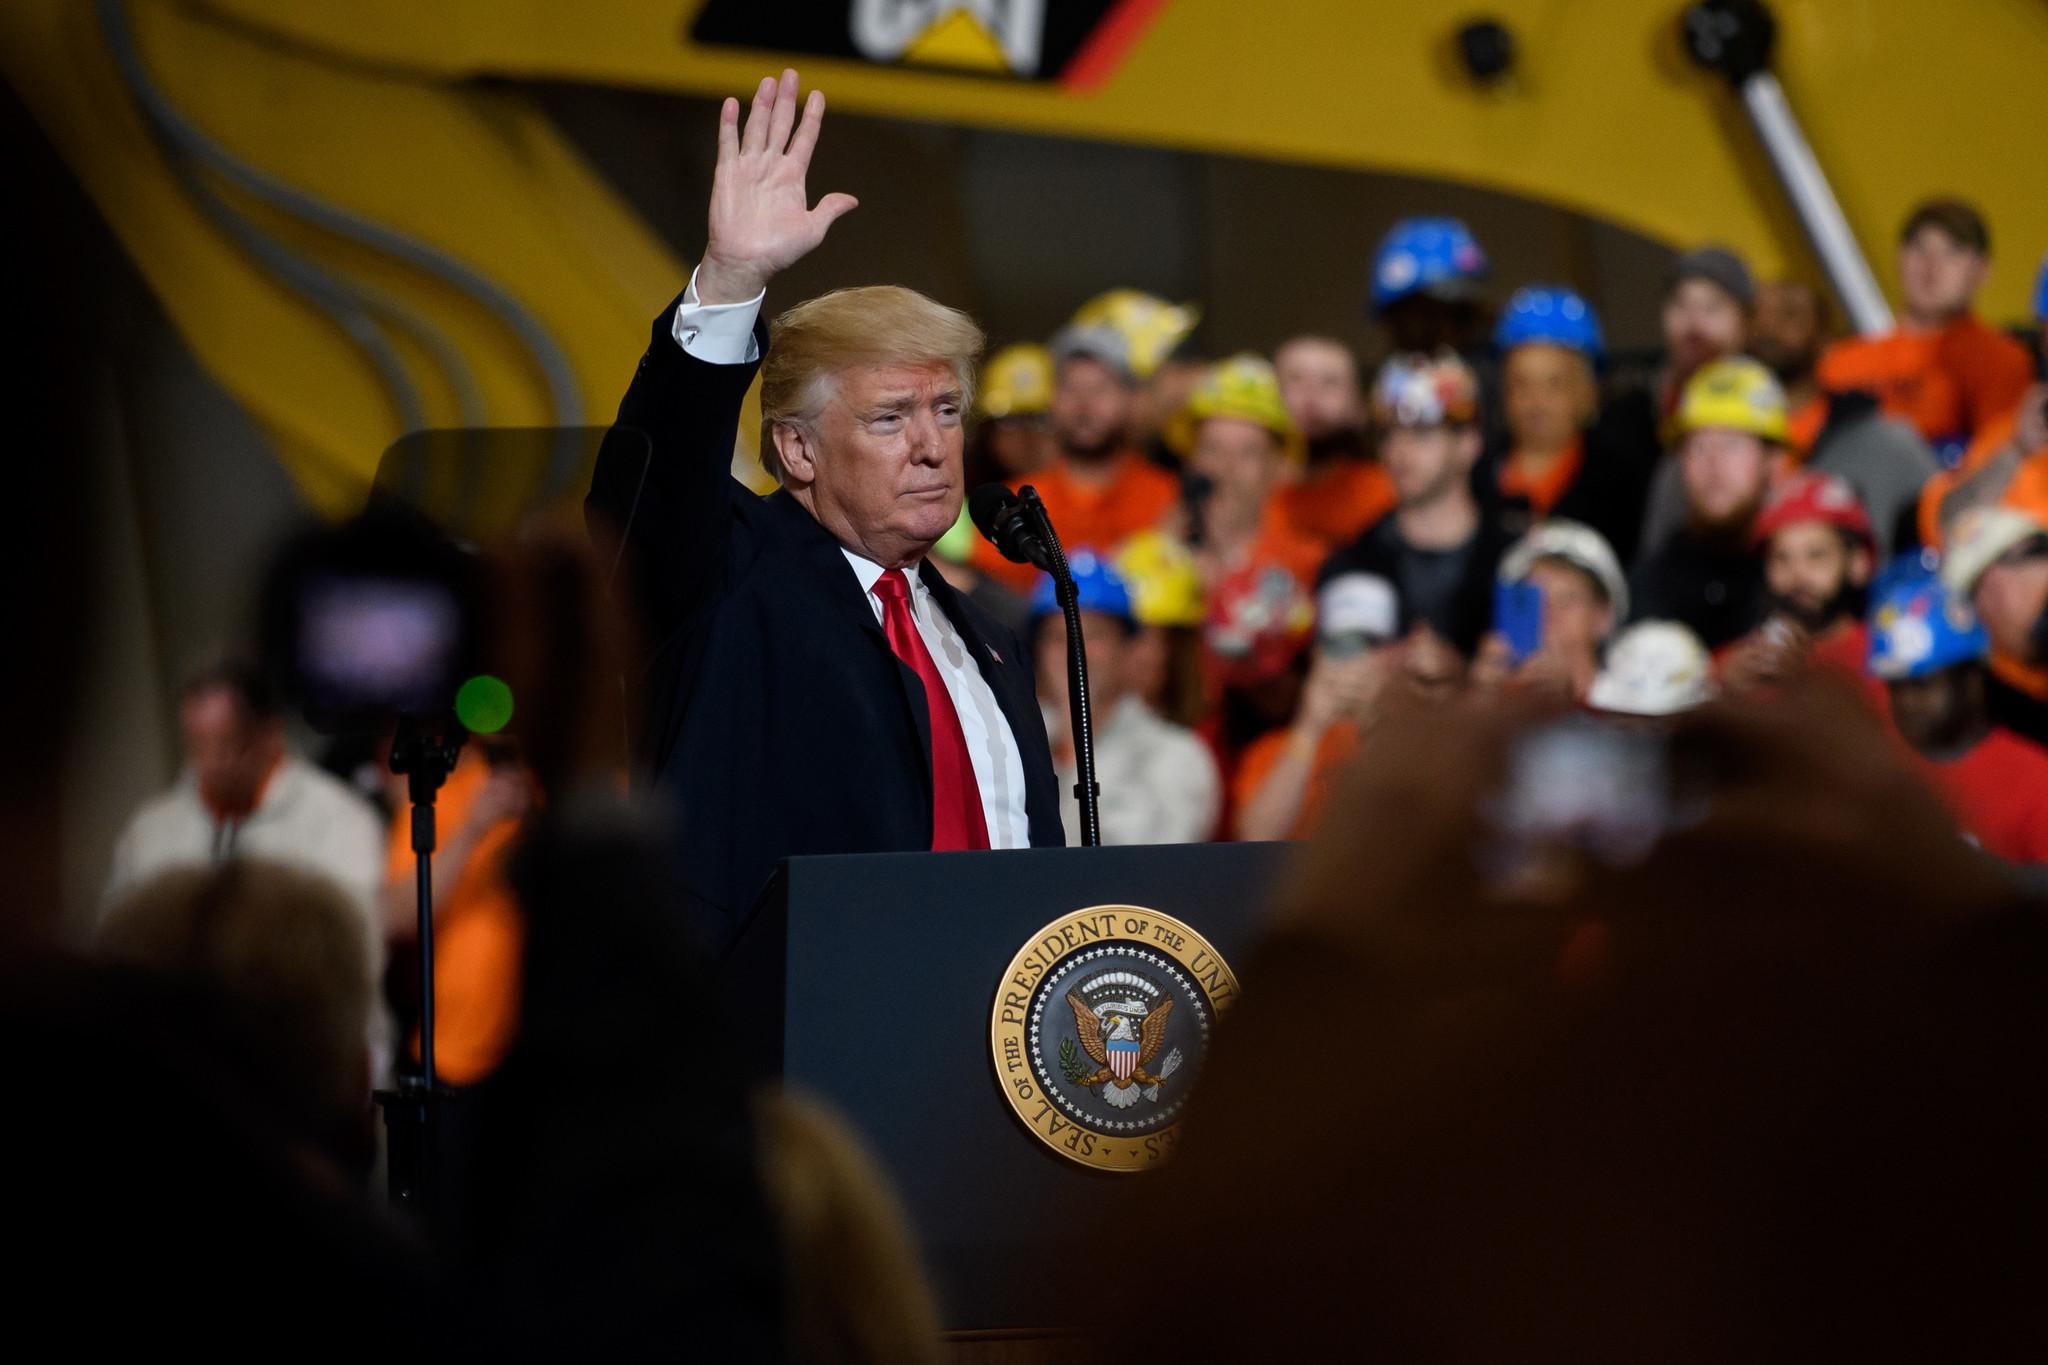 Trump Talks Infrastructure North Korea Not Stormy Daniels At